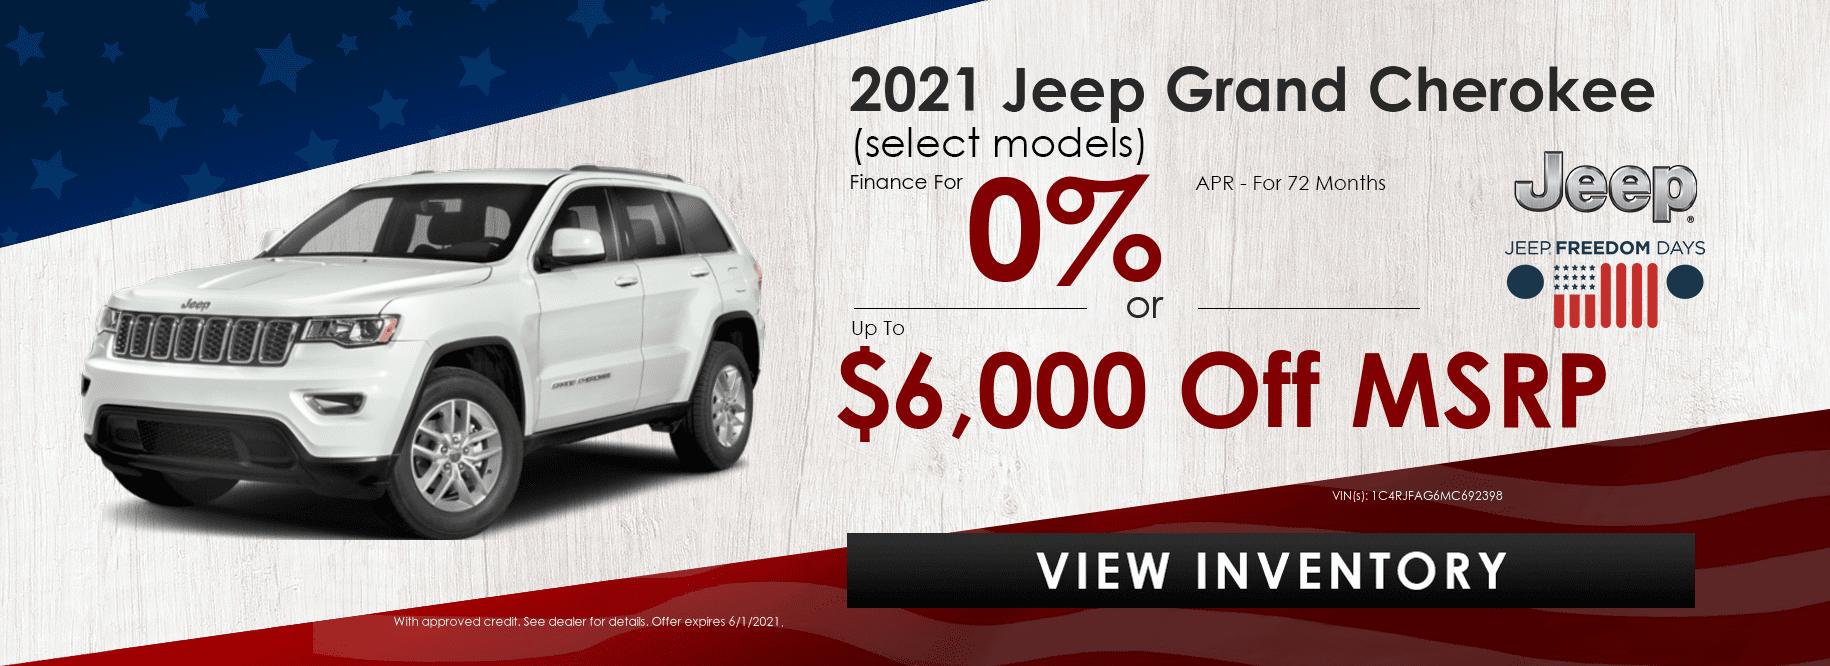 2021-Jeep-Grand-Cherokee-(select-models)-19